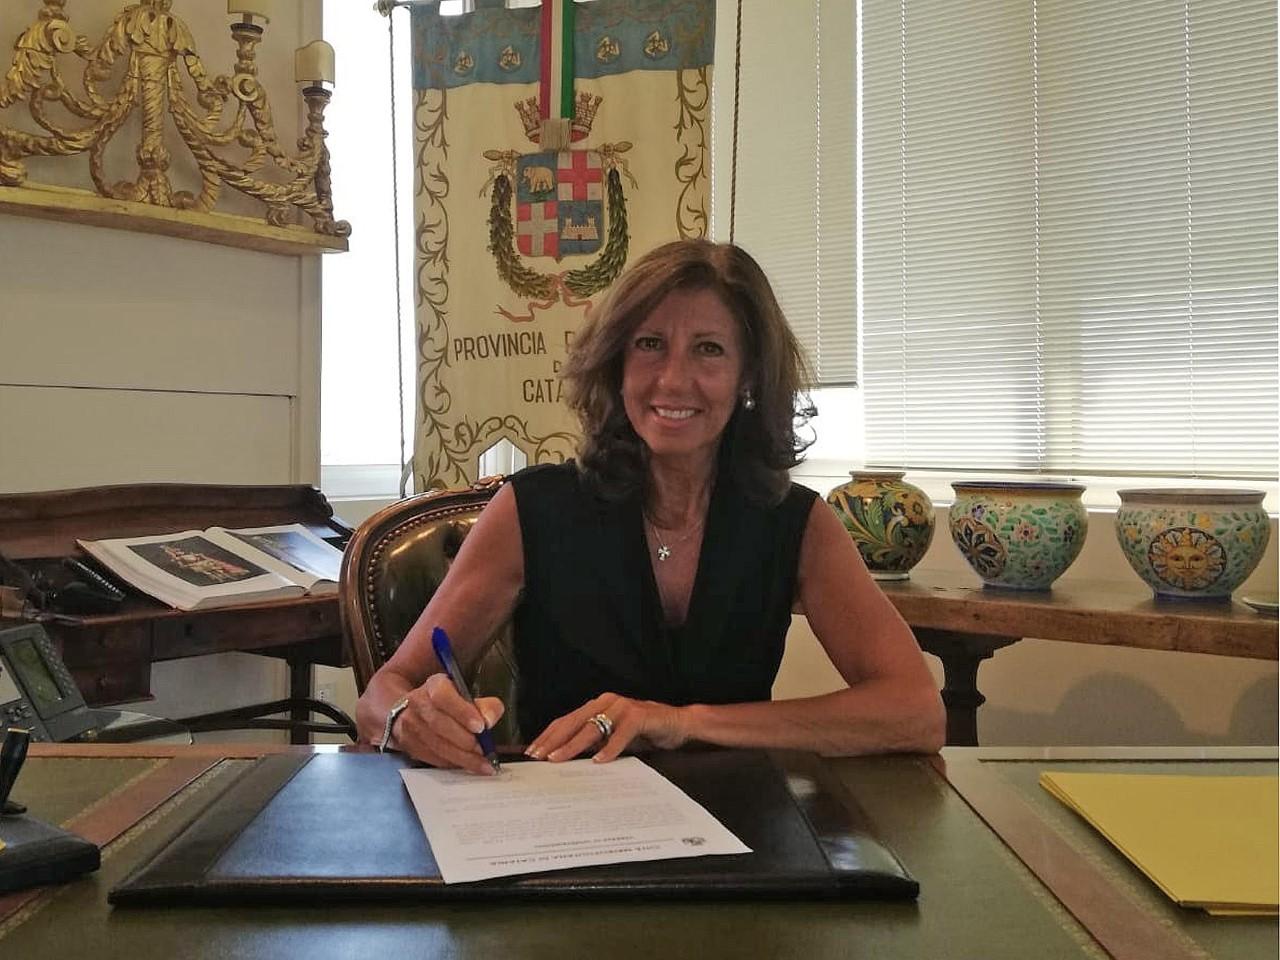 Città metropolitana di Catania, Gargano nominata commissario straordinario